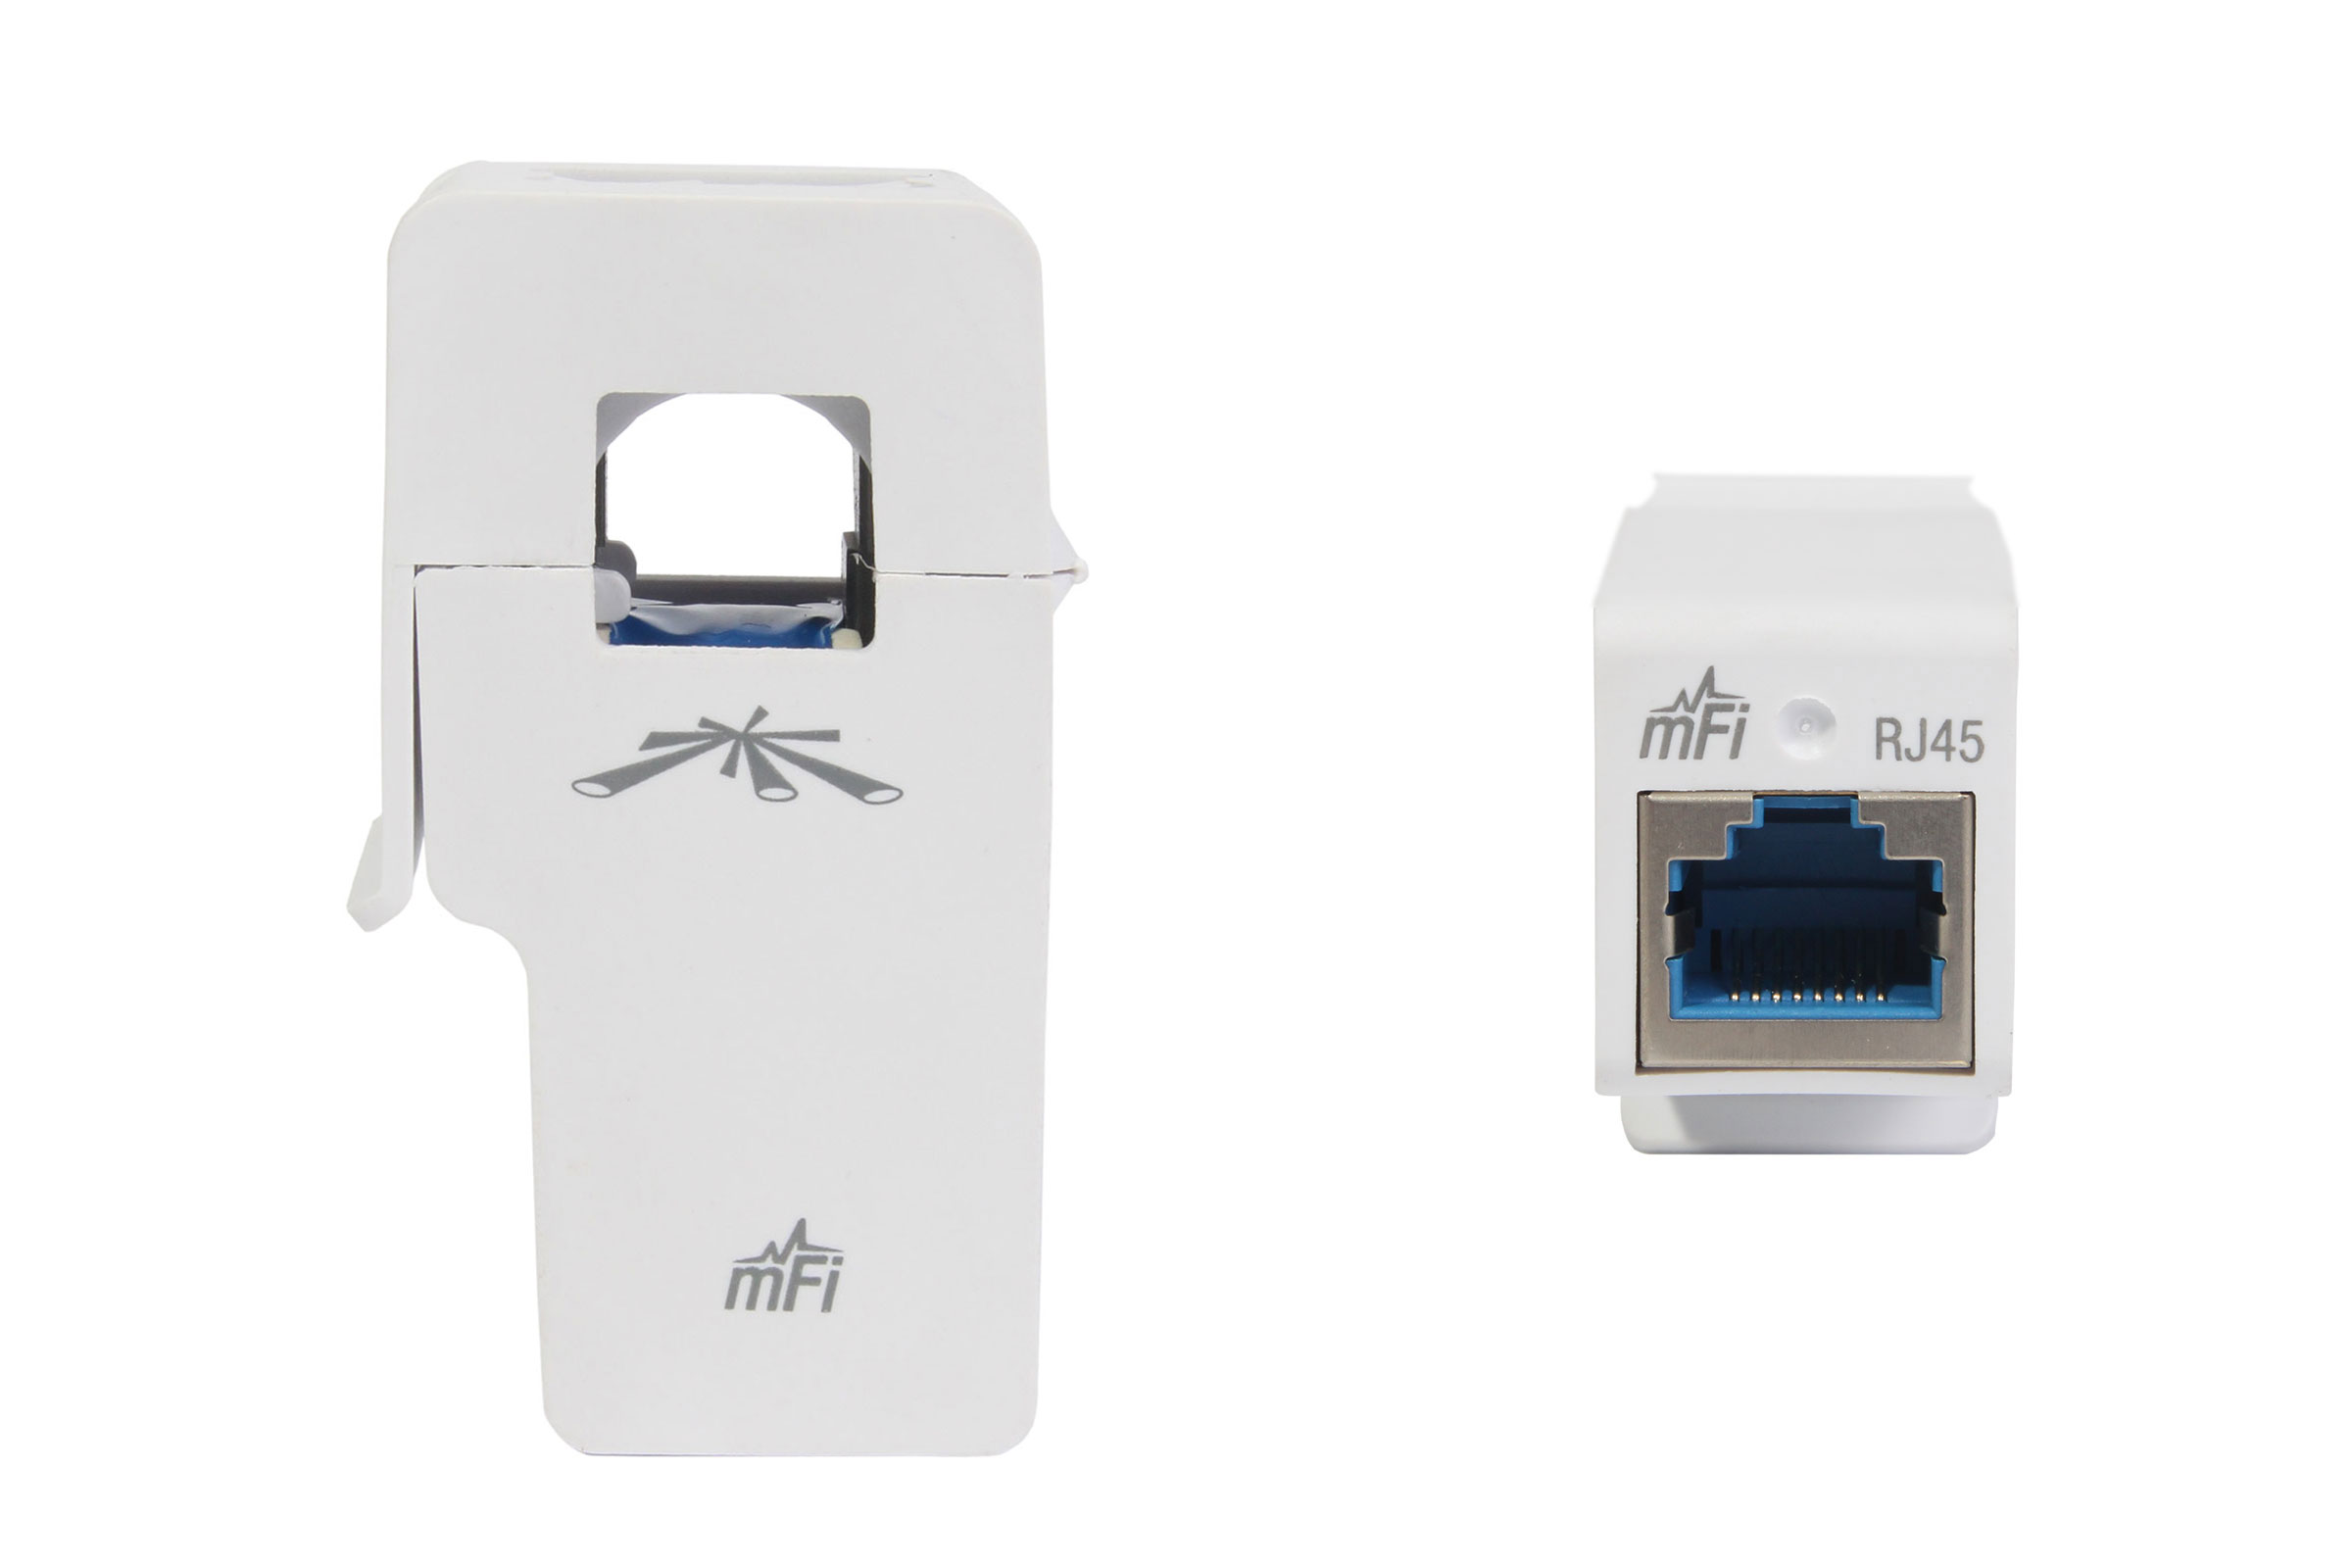 Ubiquiti Networks mFi-CS внешний вид и интерфейсы